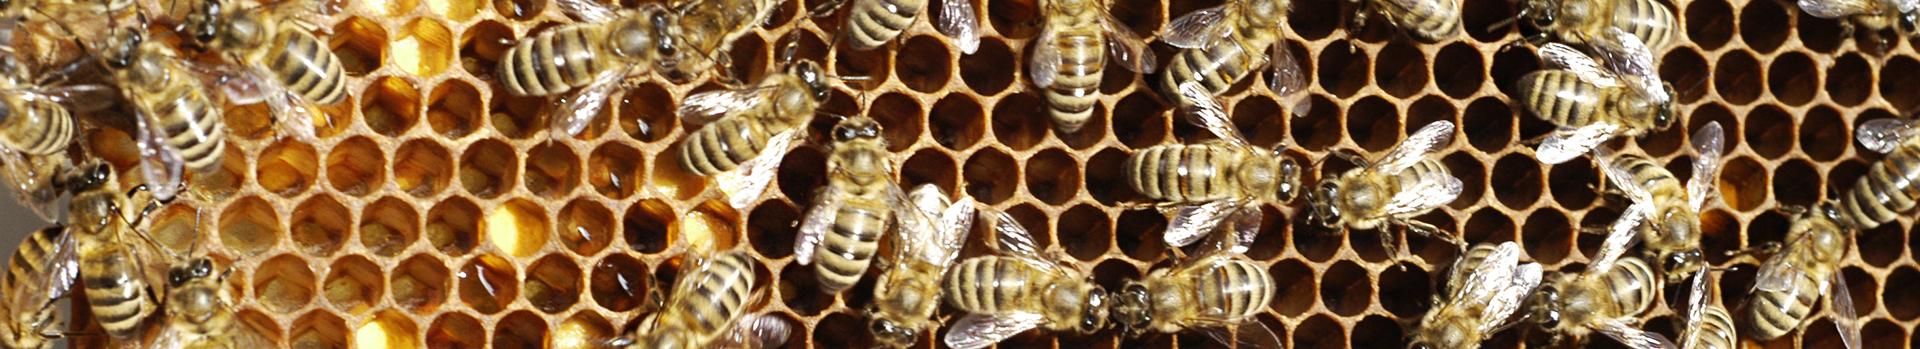 Biocertification of Honey